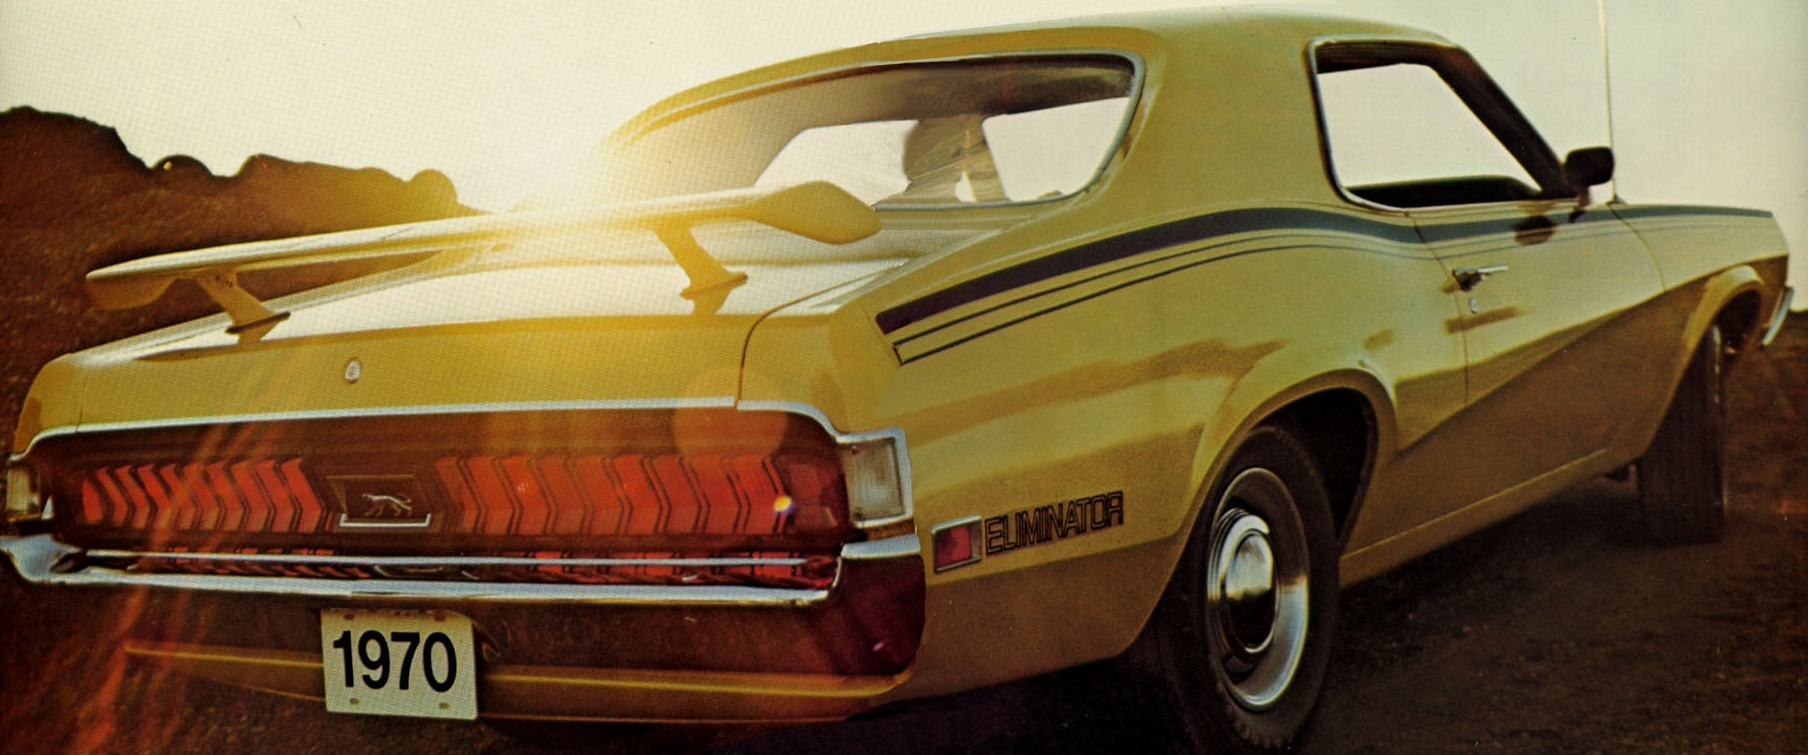 1969 1970 Mercury Cougar Eliminator Tommy S Car Blog